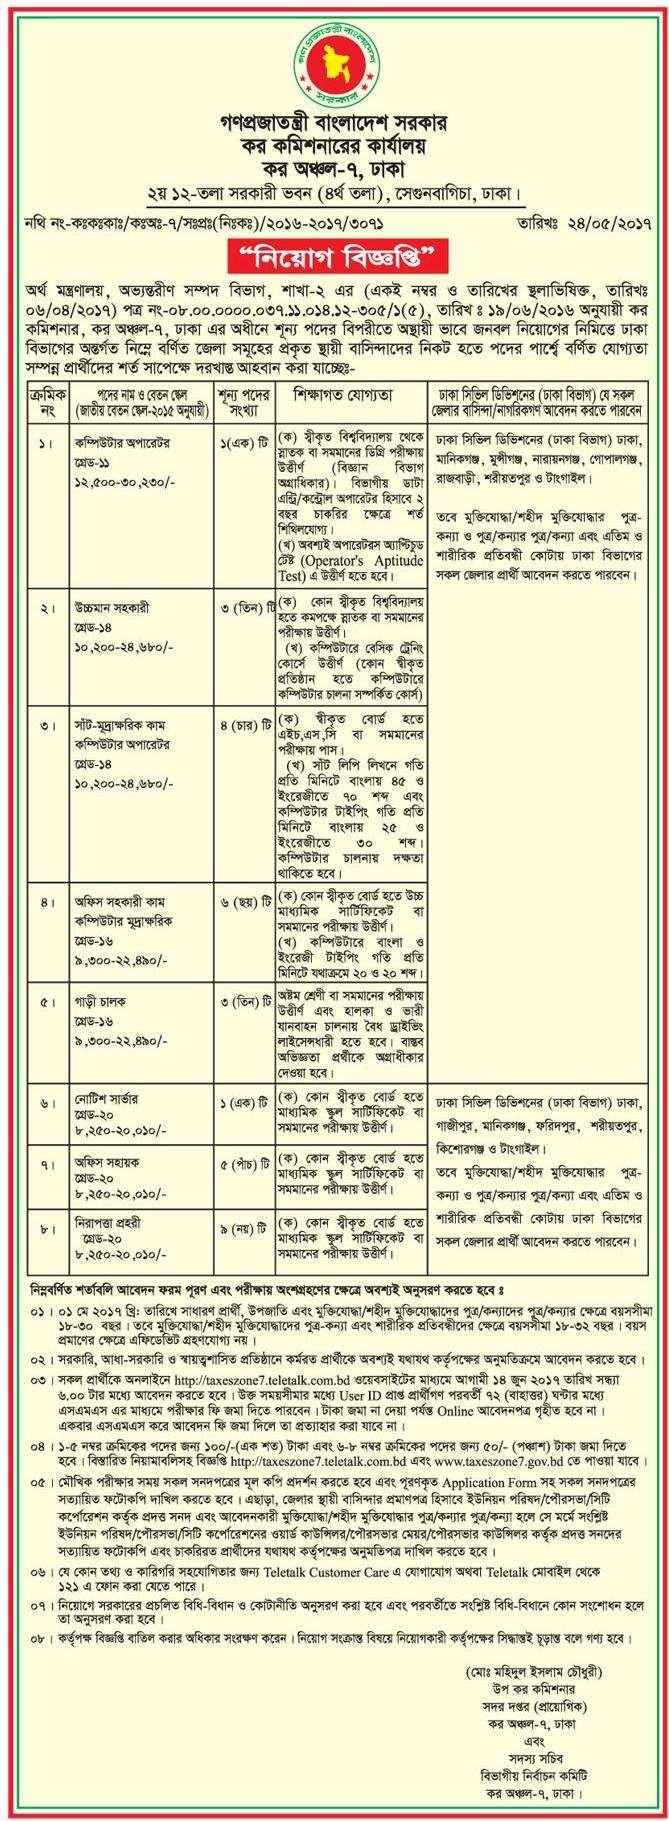 Tax Commissioner office Job Circular 2017